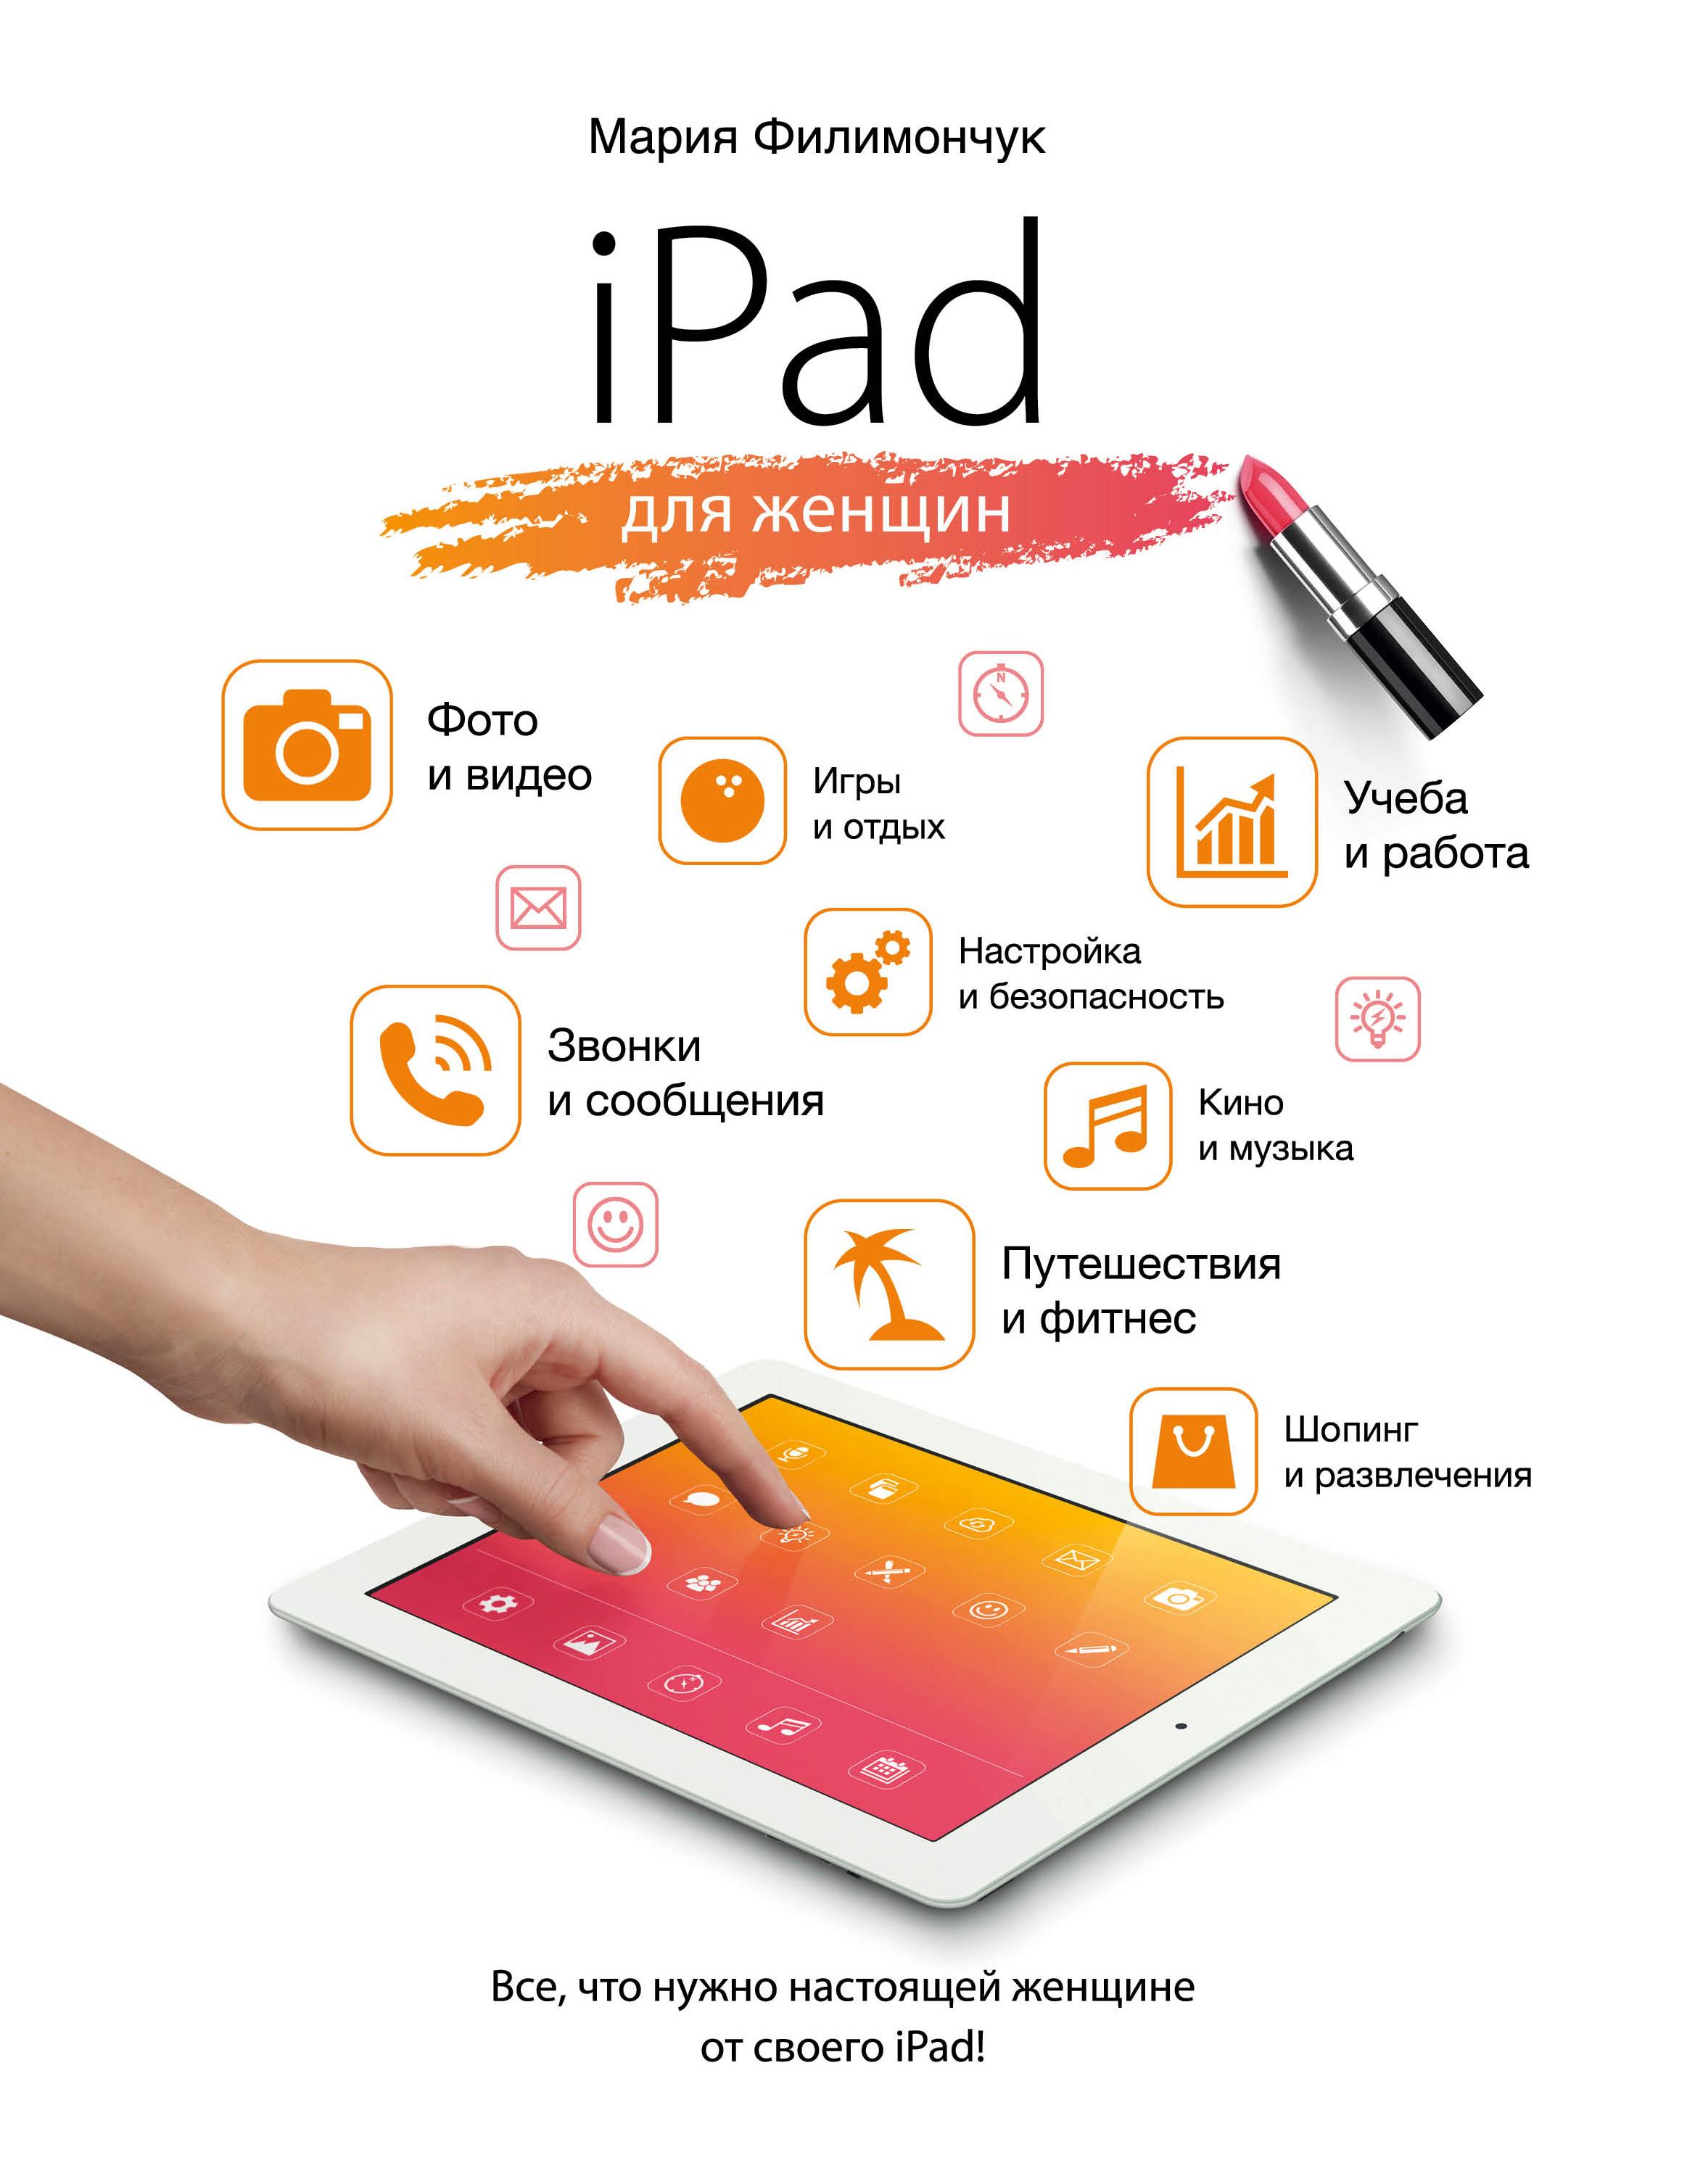 Филимончук М.З. iPad для женщин